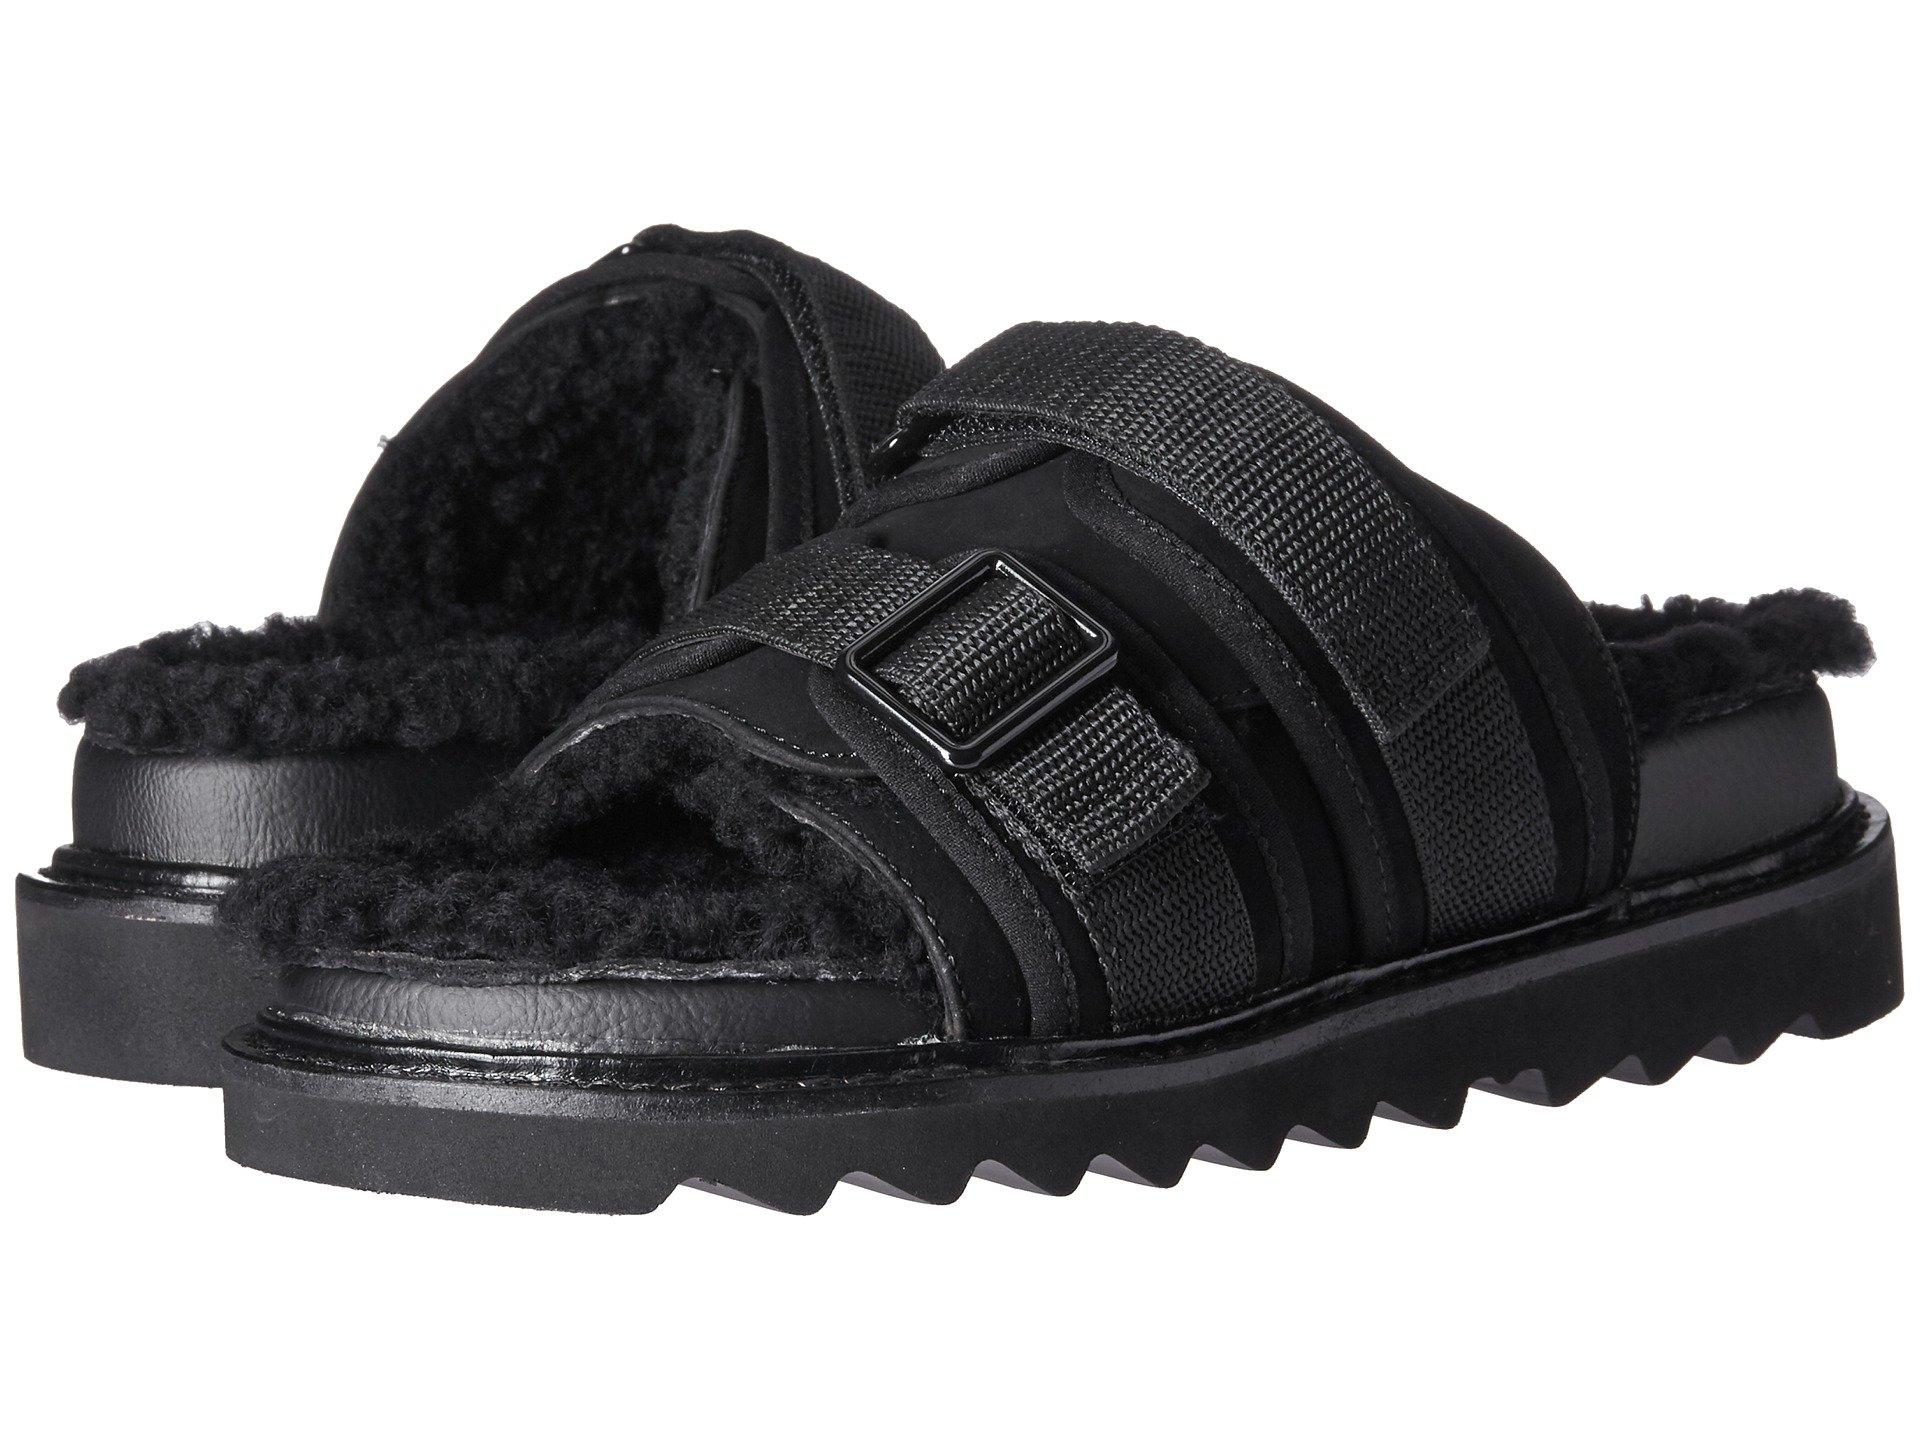 Sandalias para Mujer Yand#39;s by Yohji Yamamoto Sheep Skin Foot Bed  +